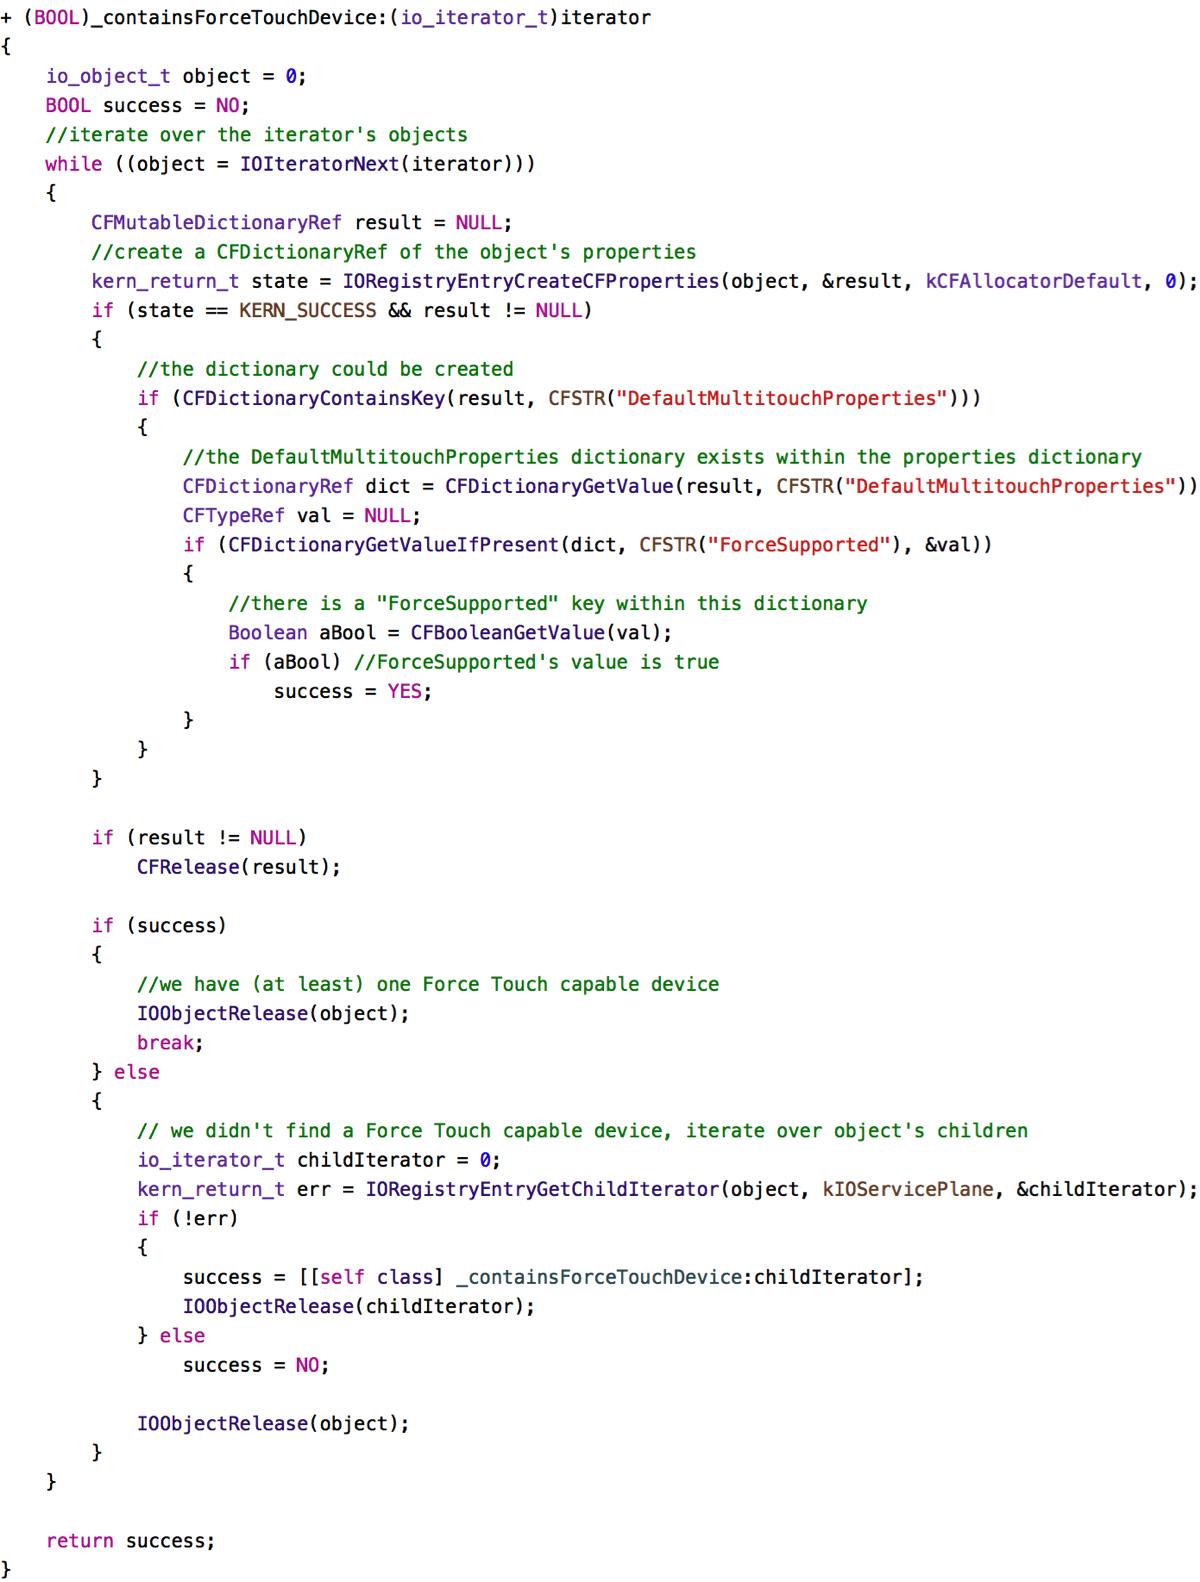 Code Listing #2